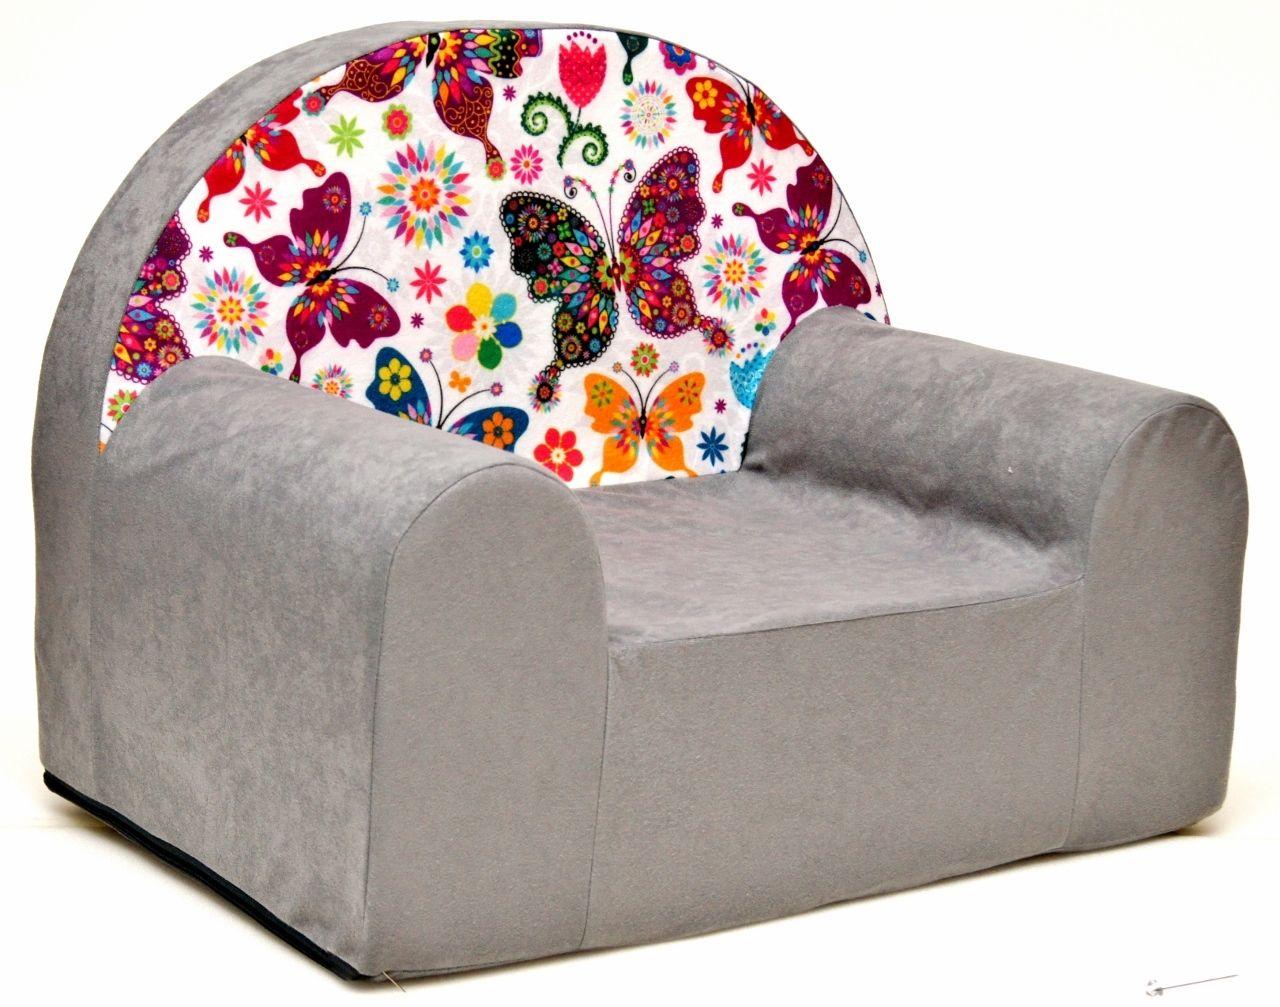 Children's Foam Armchair type W wfa33